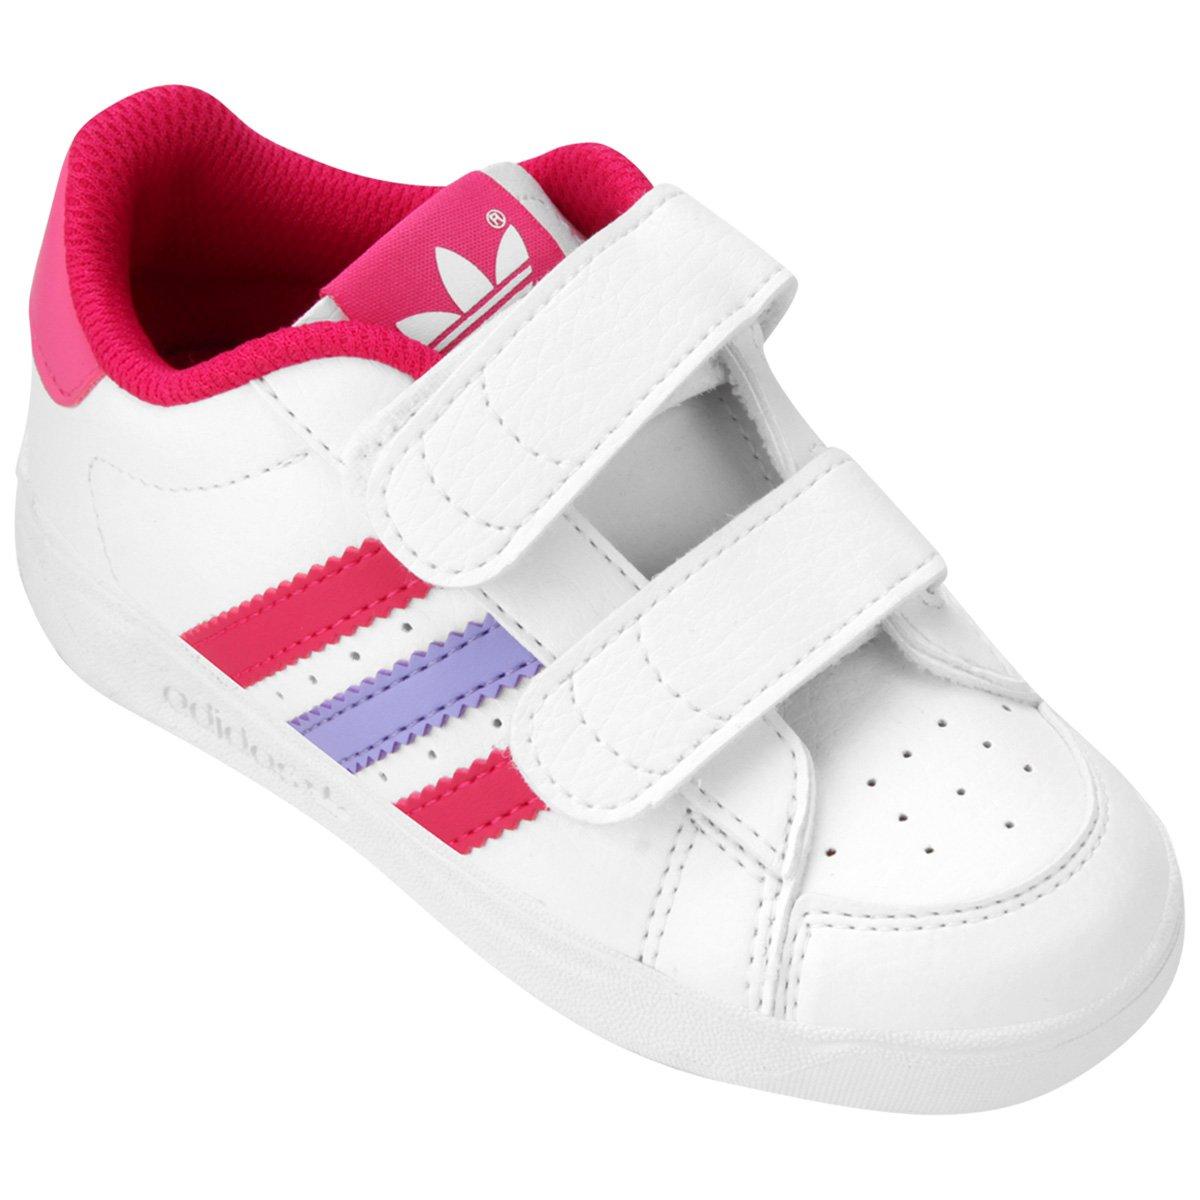 new concept c4c29 0ccf1 Tênis Adidas Alumno CF Infantil - Compre Agora  Netshoes